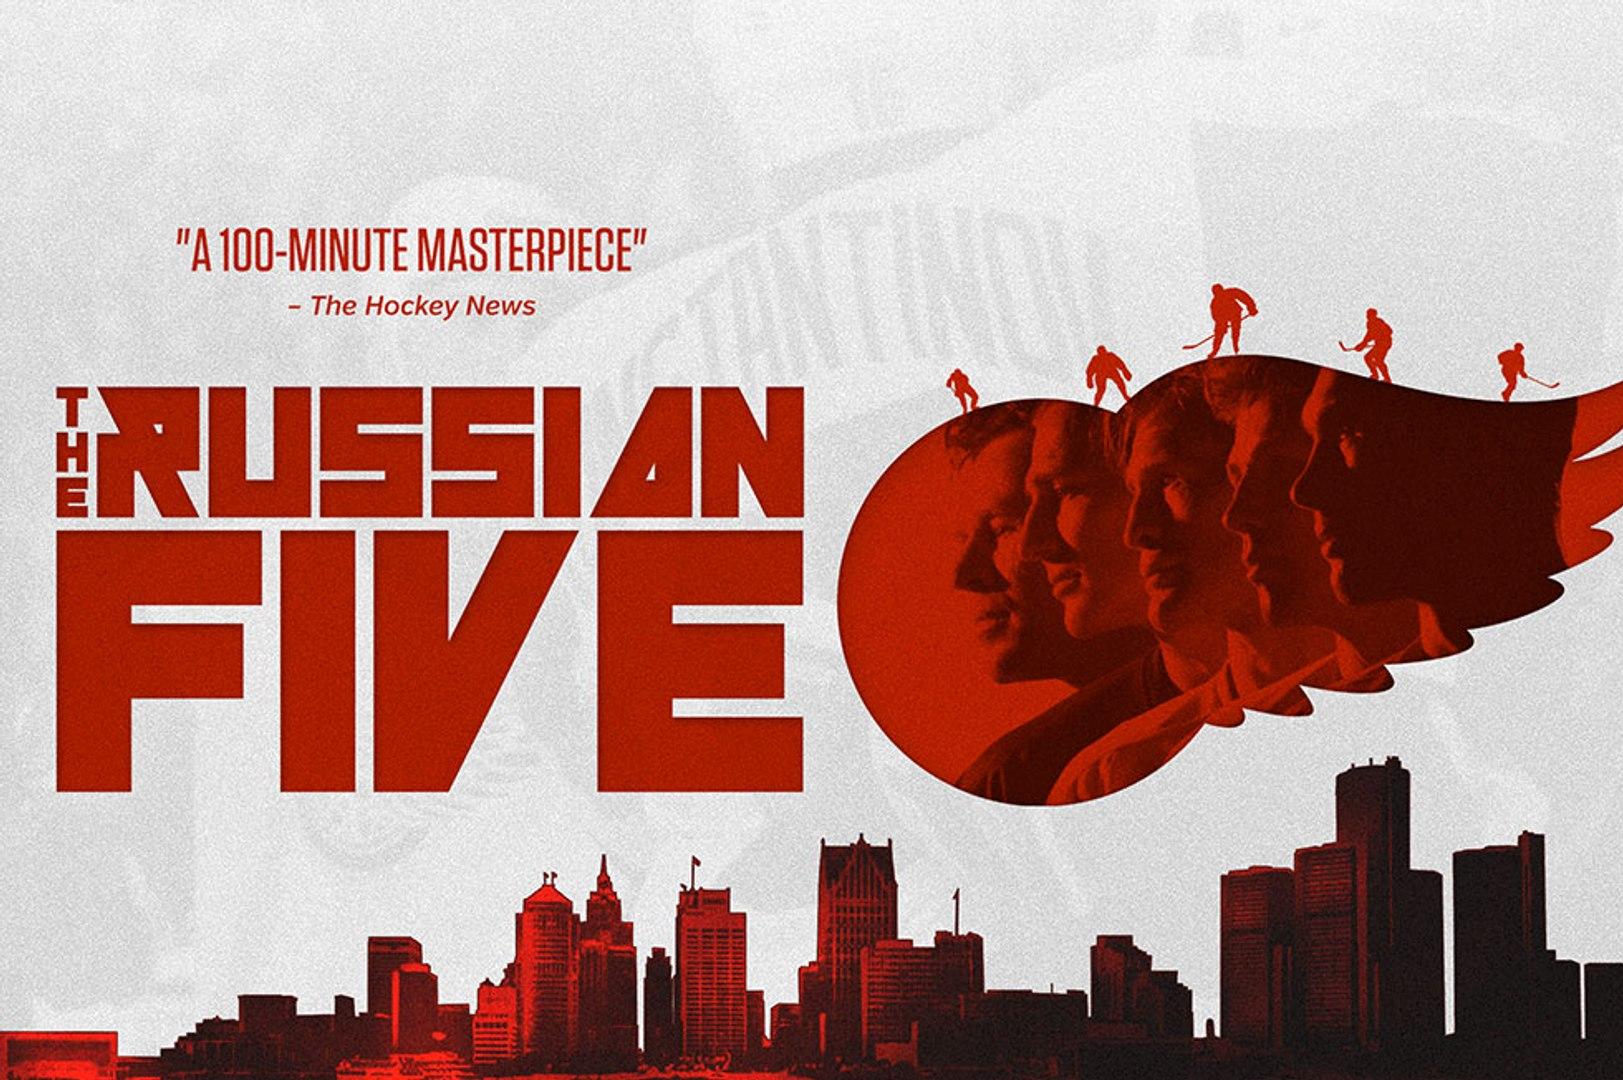 The Russian Five Trailer #1 (2019) Jim Devellano, Sergei Fedorov Documentary Movie HD